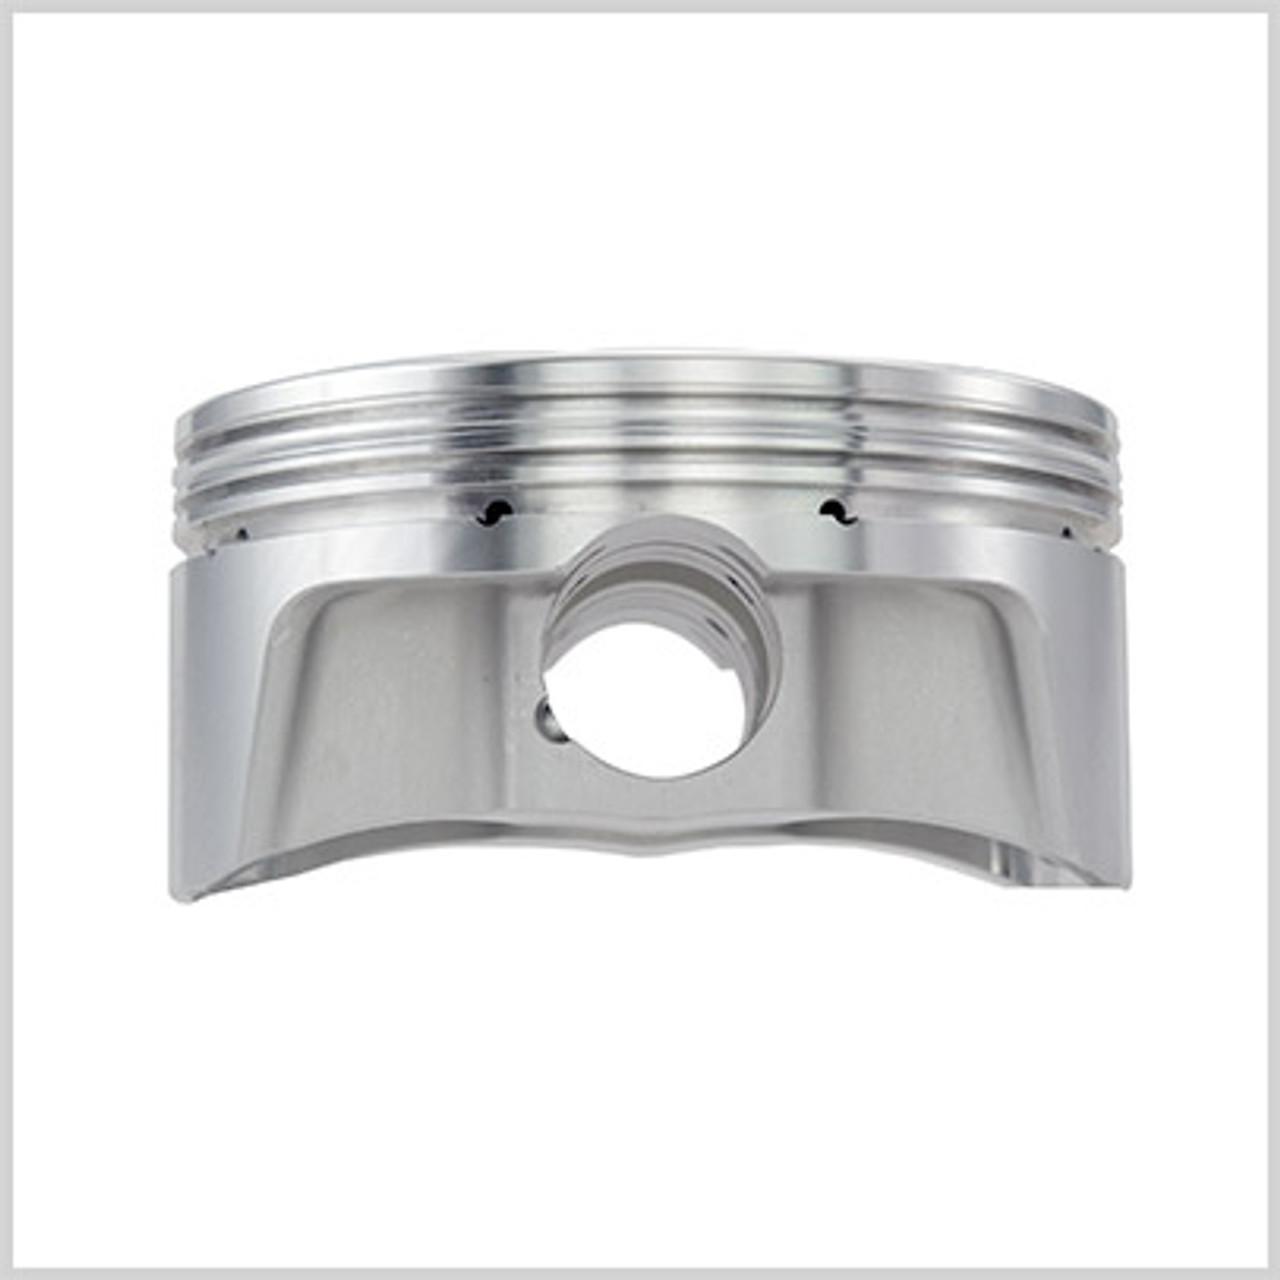 "Carillo CP Bullet LS 4.010"" Pistons Set | 3.622"" Stroke -5.6cc Dish Top | N/A"